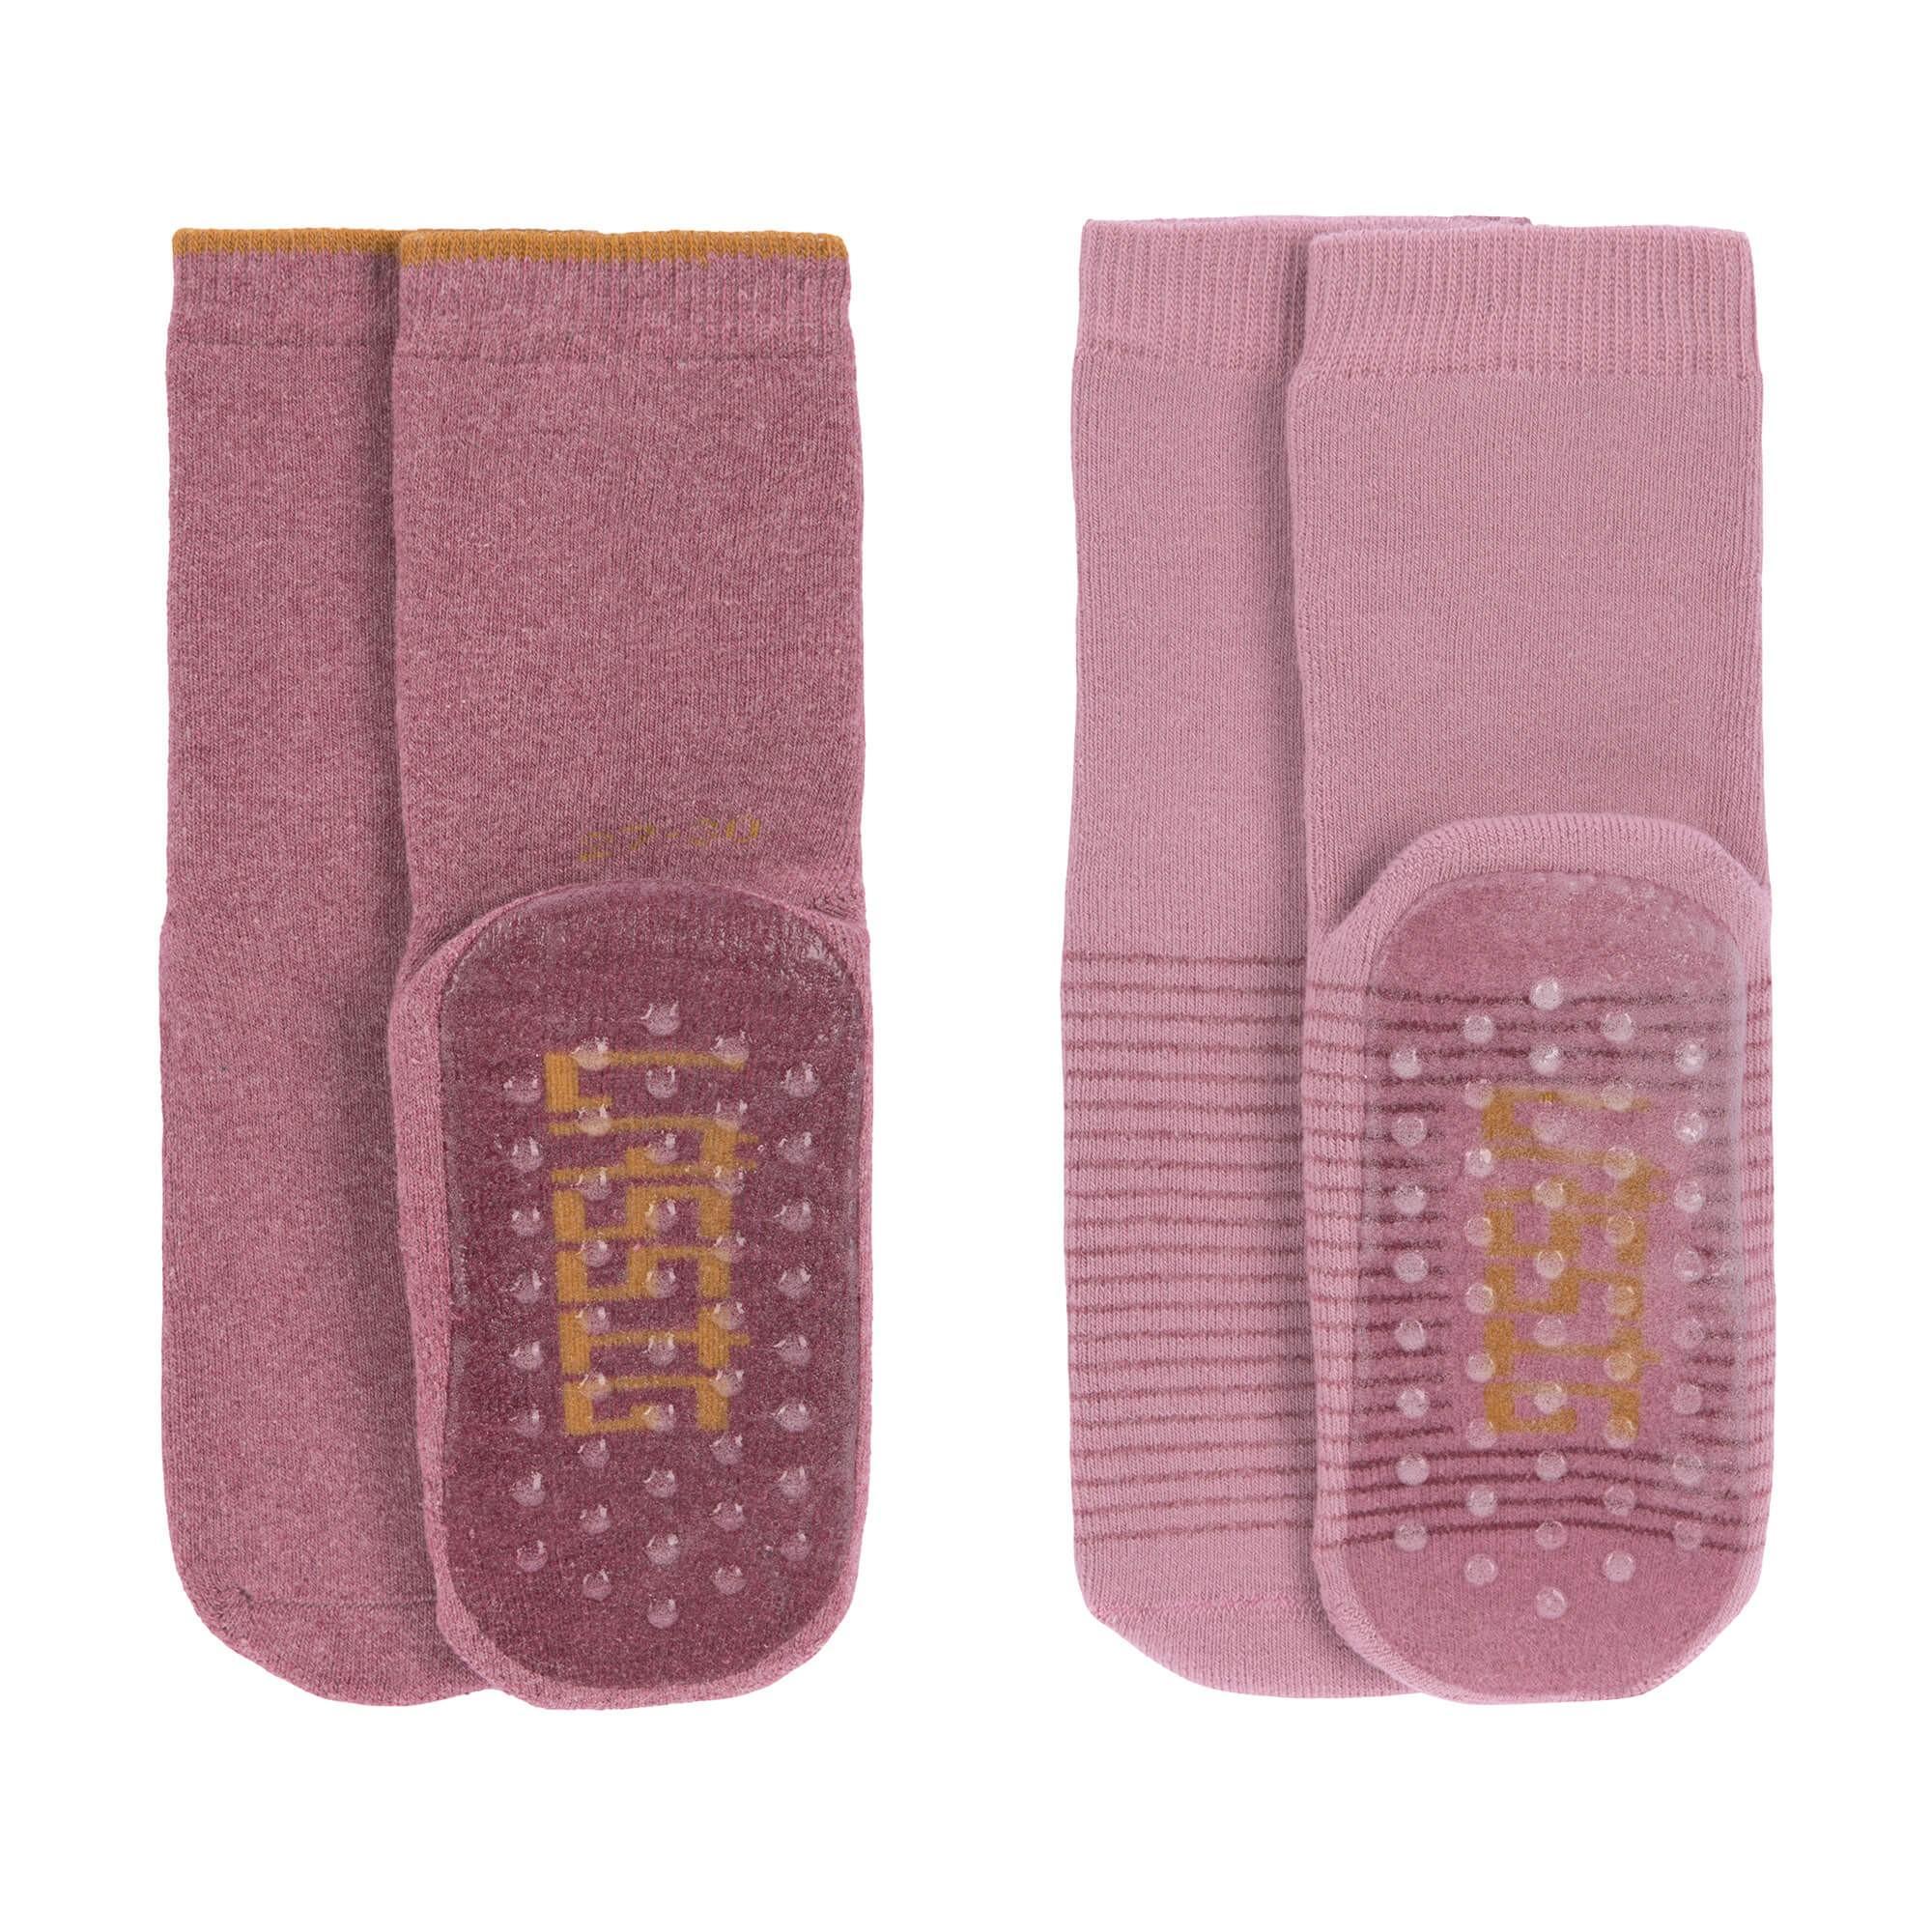 Lassig - Anti-slip Socks 2 pcs. assorted rosewood/rose, Size: 19-22